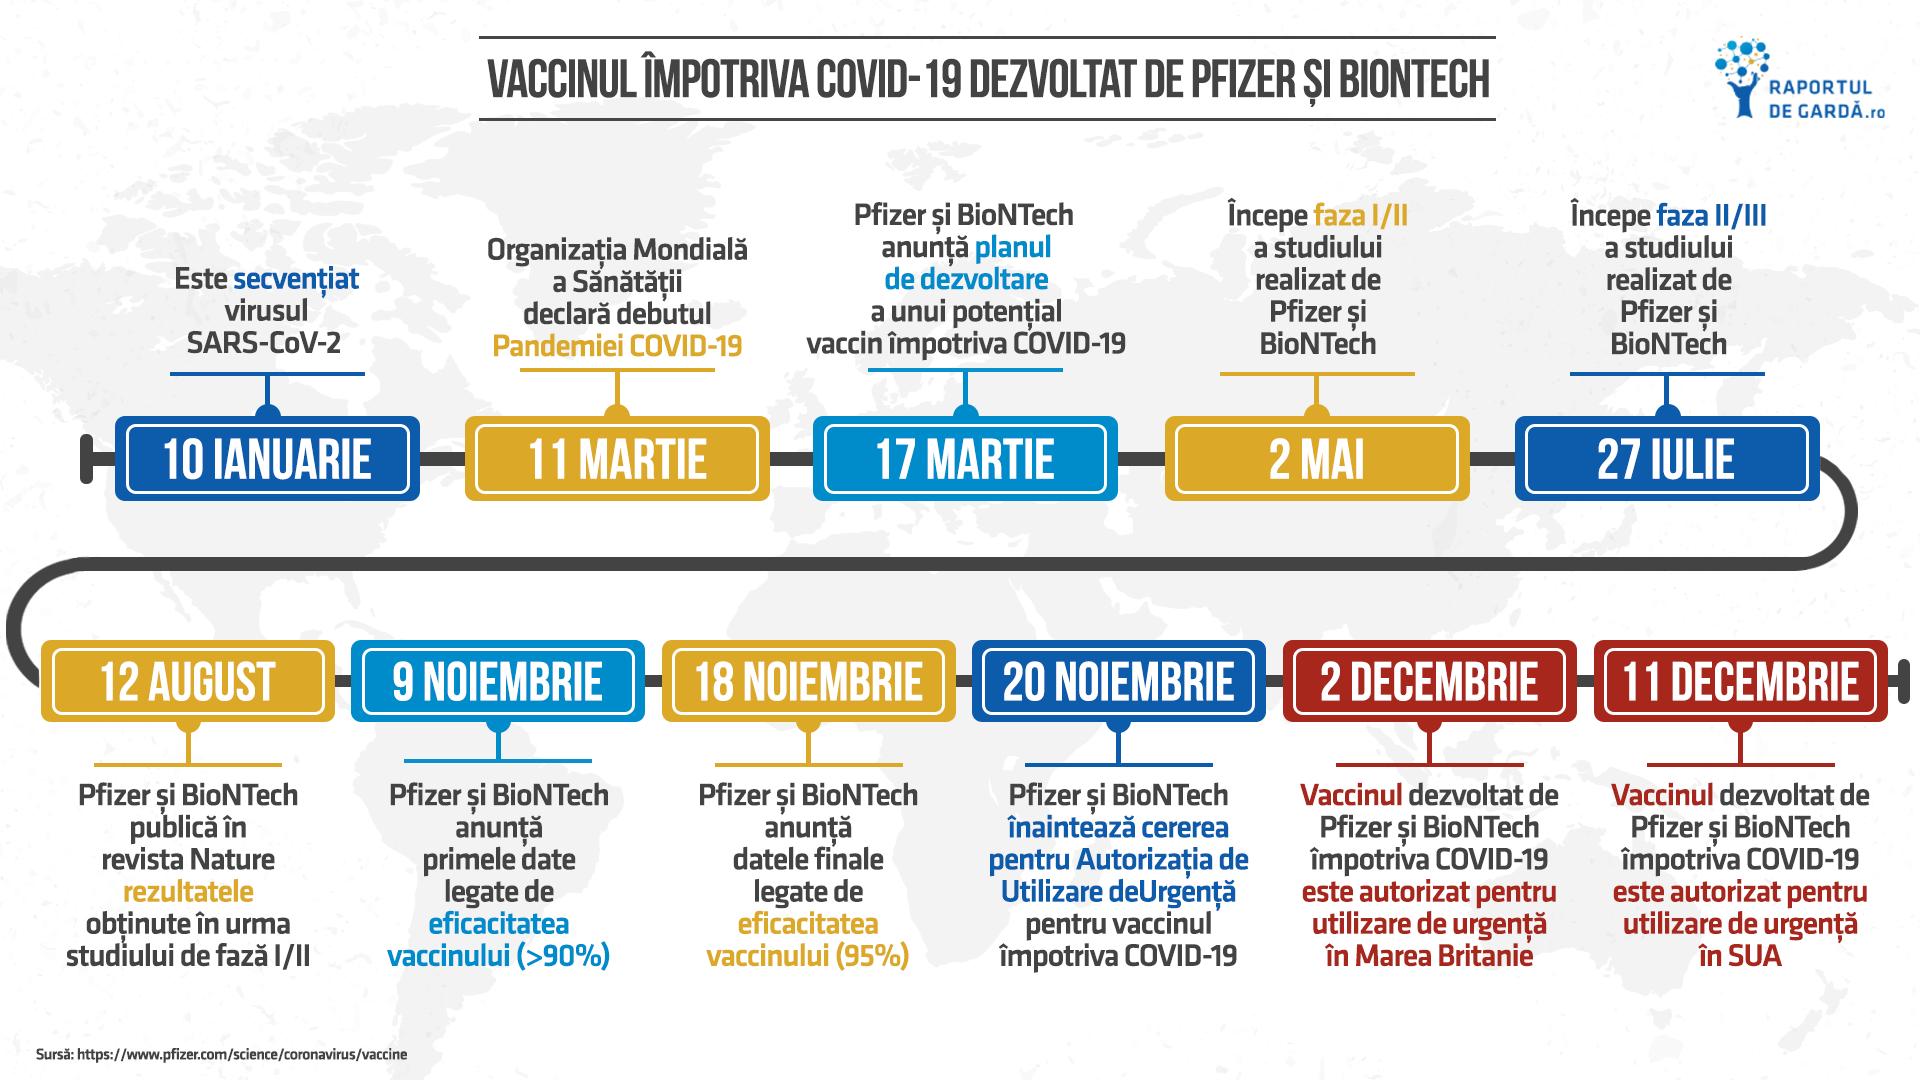 Timeline dezvoltare și aprobare vaccin Pfizer BioNTech împotriva COVID-19